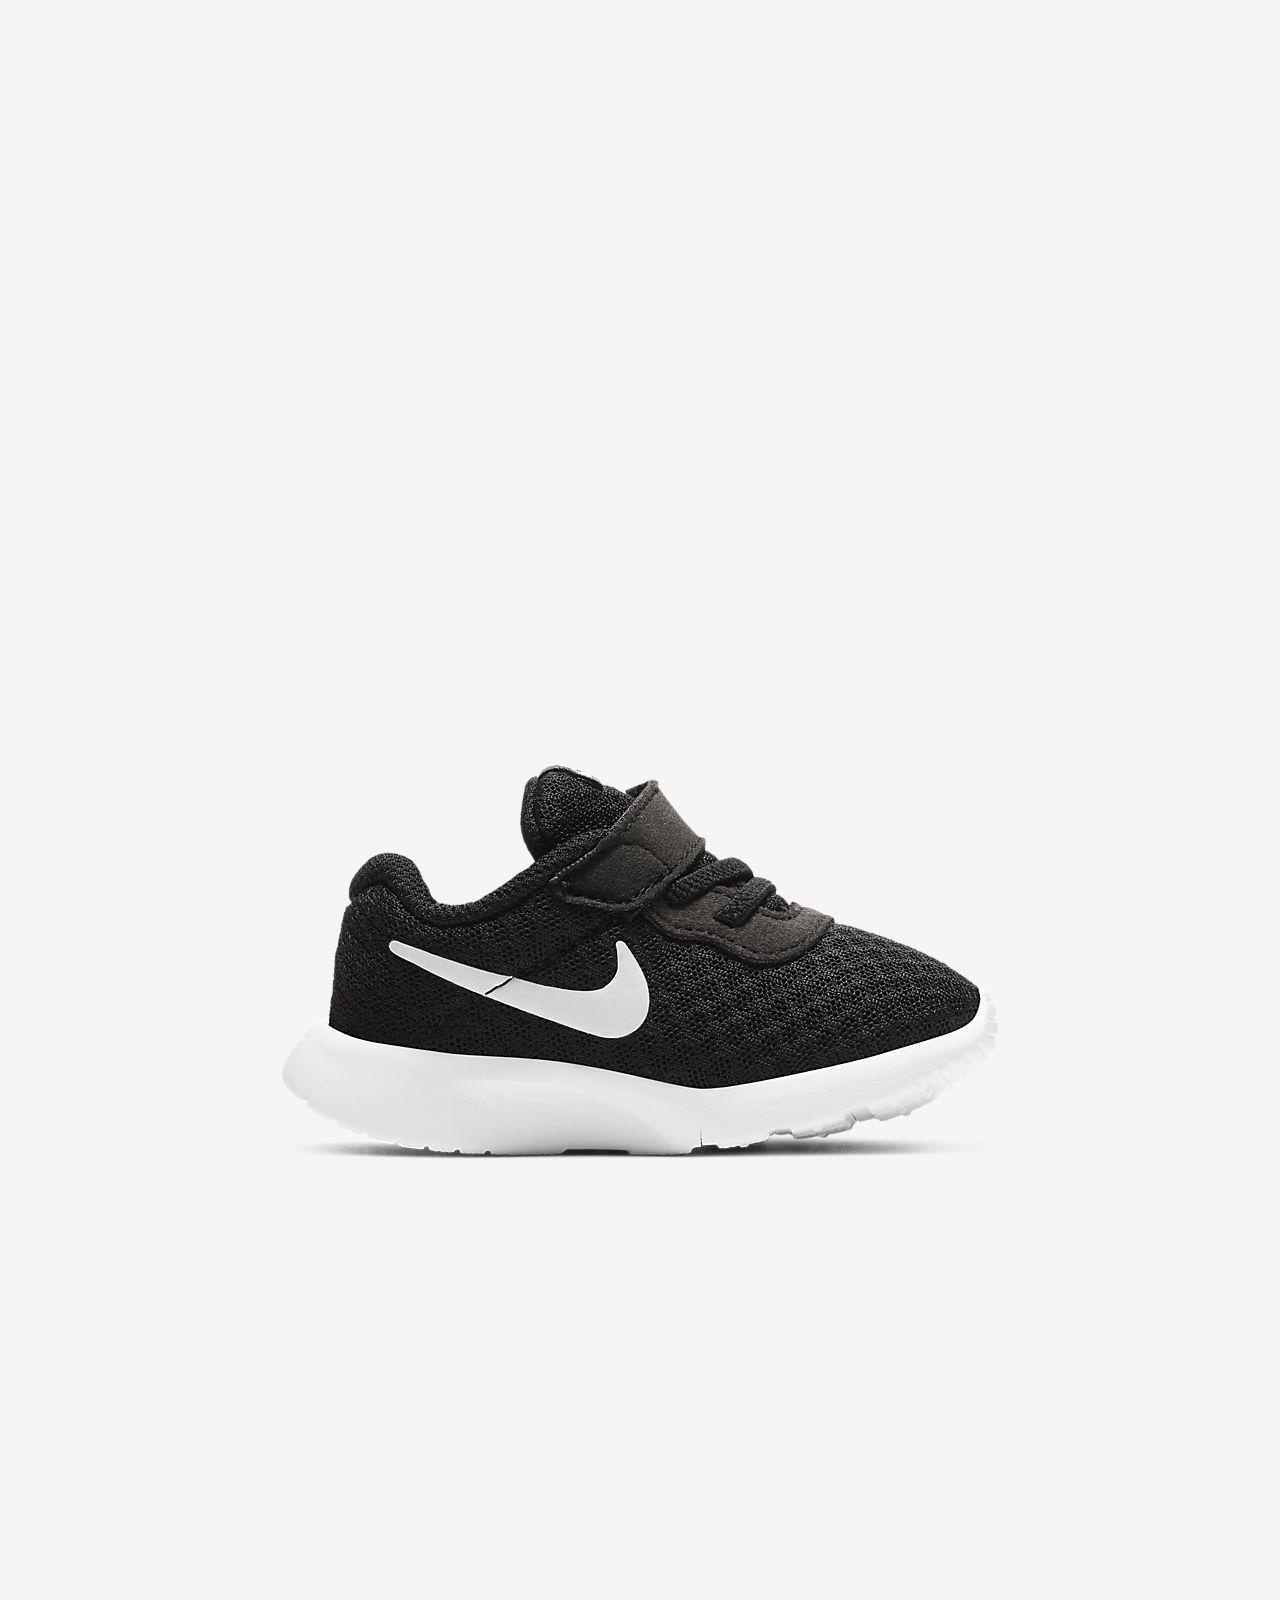 Nike Tanjun Schoen baby'speuters (17 27)